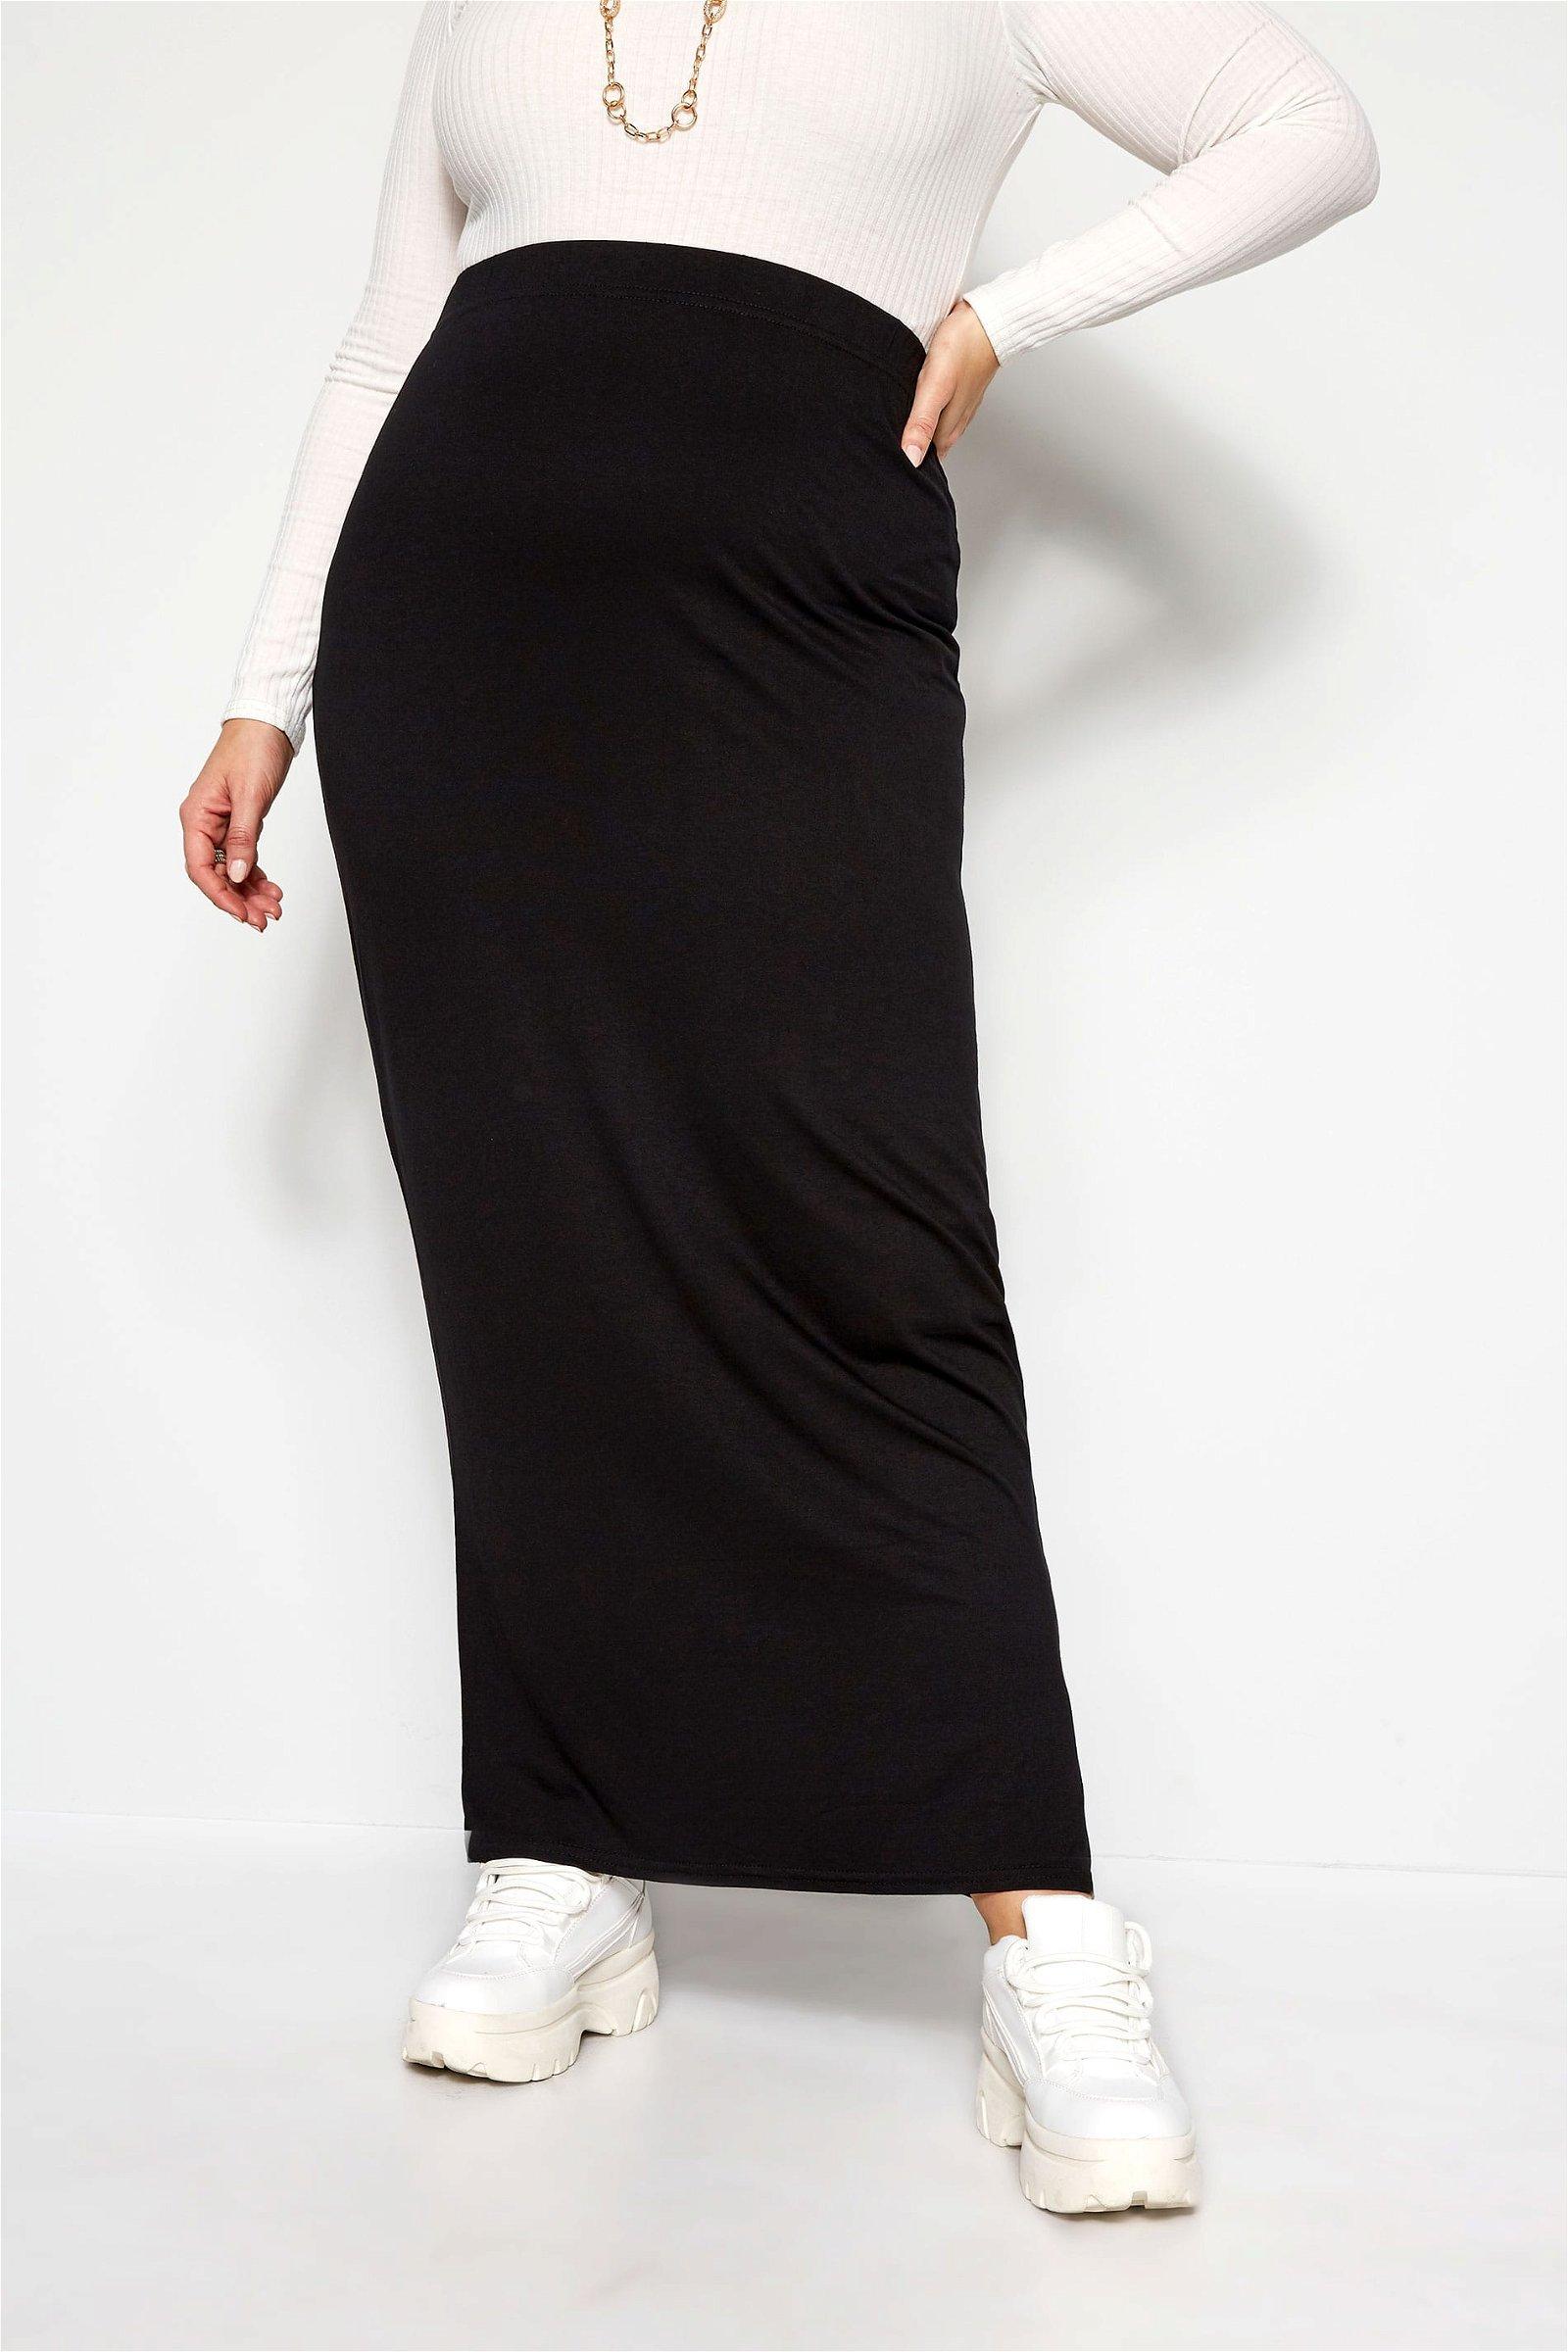 Black Jersey Maxi Tube Skirt